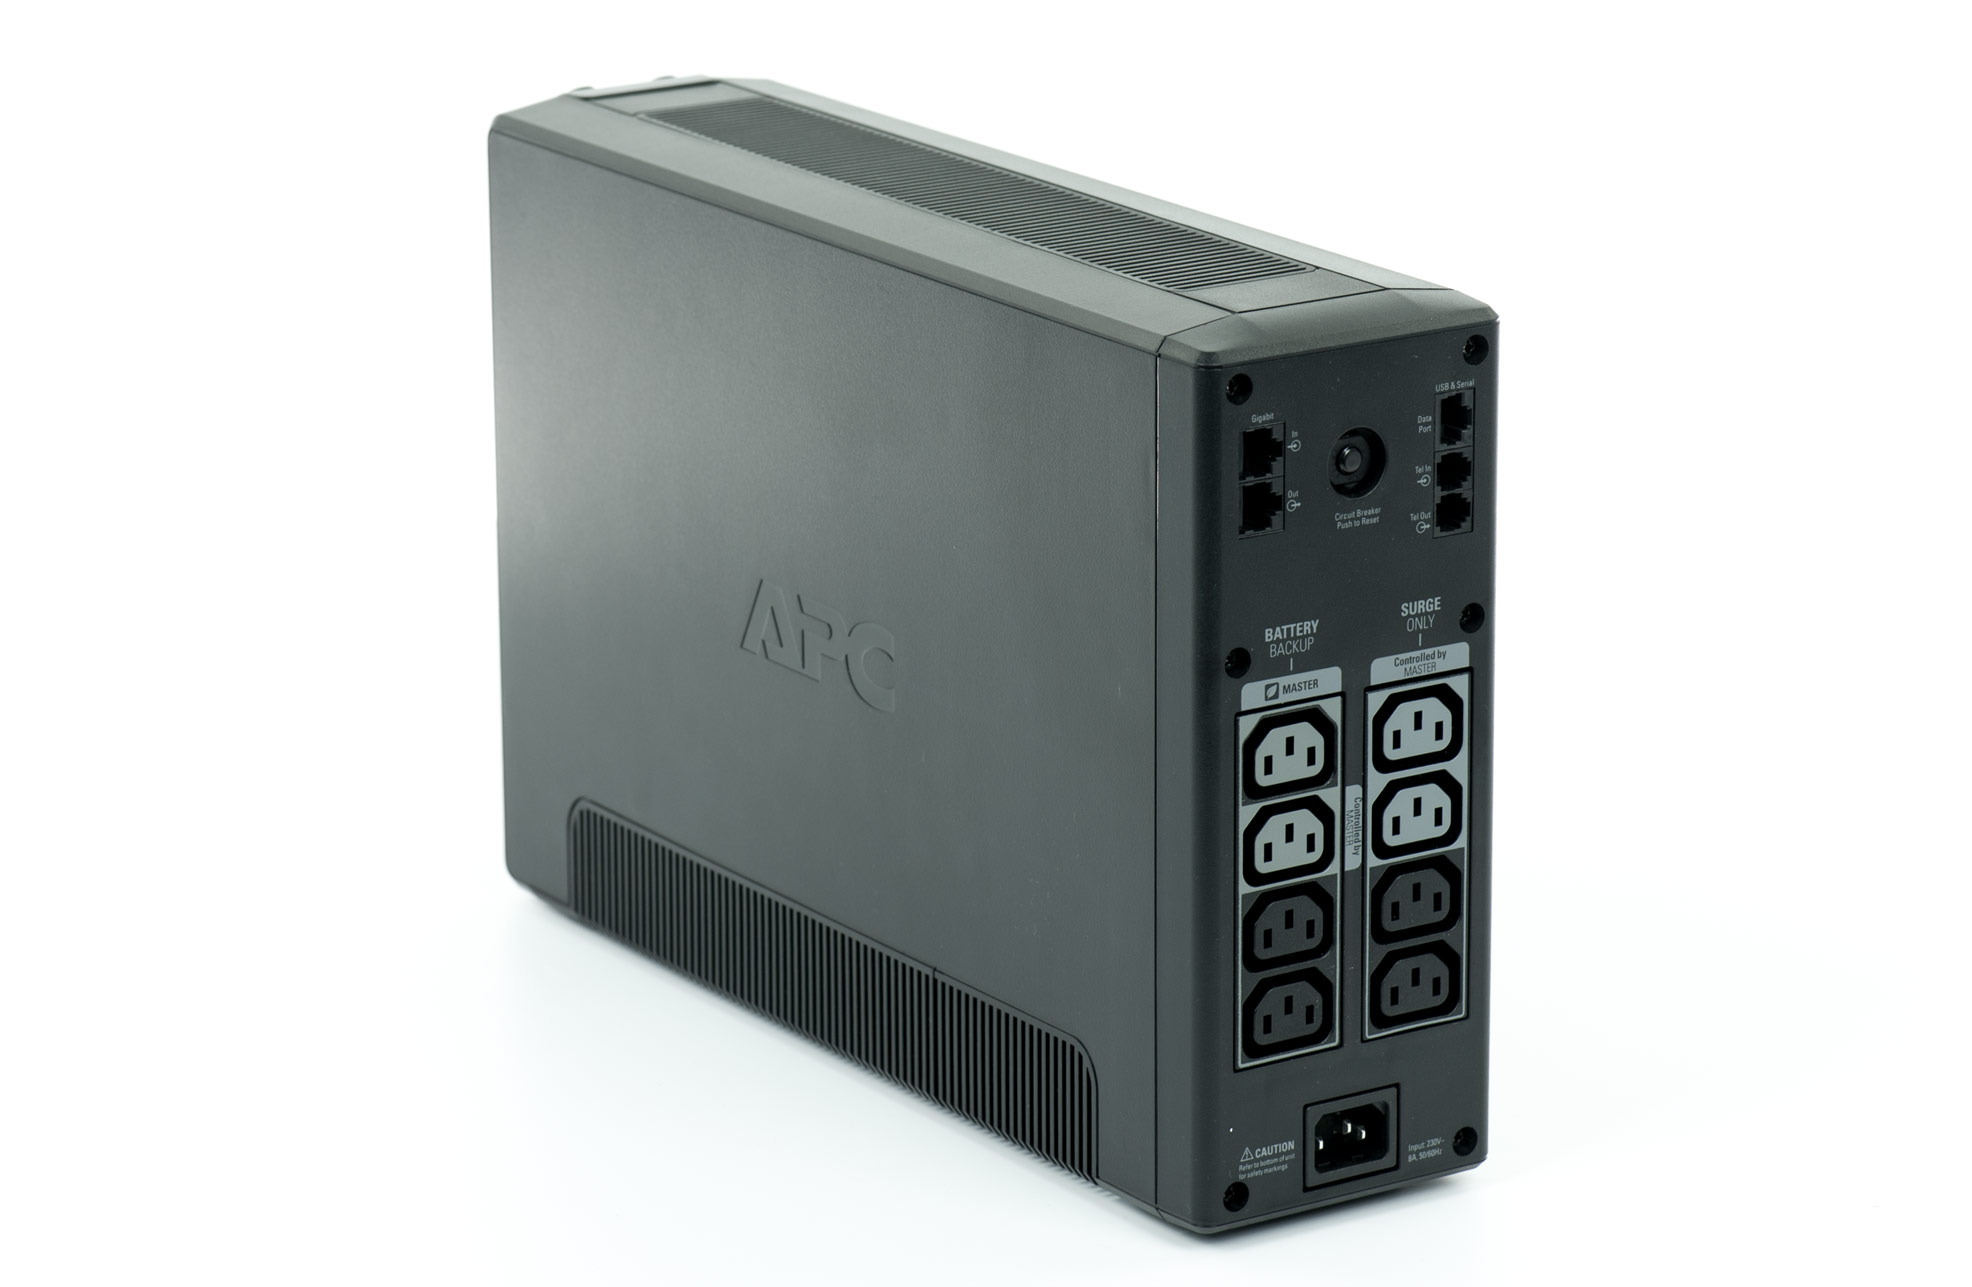 APC model Back-UPS Pro 900